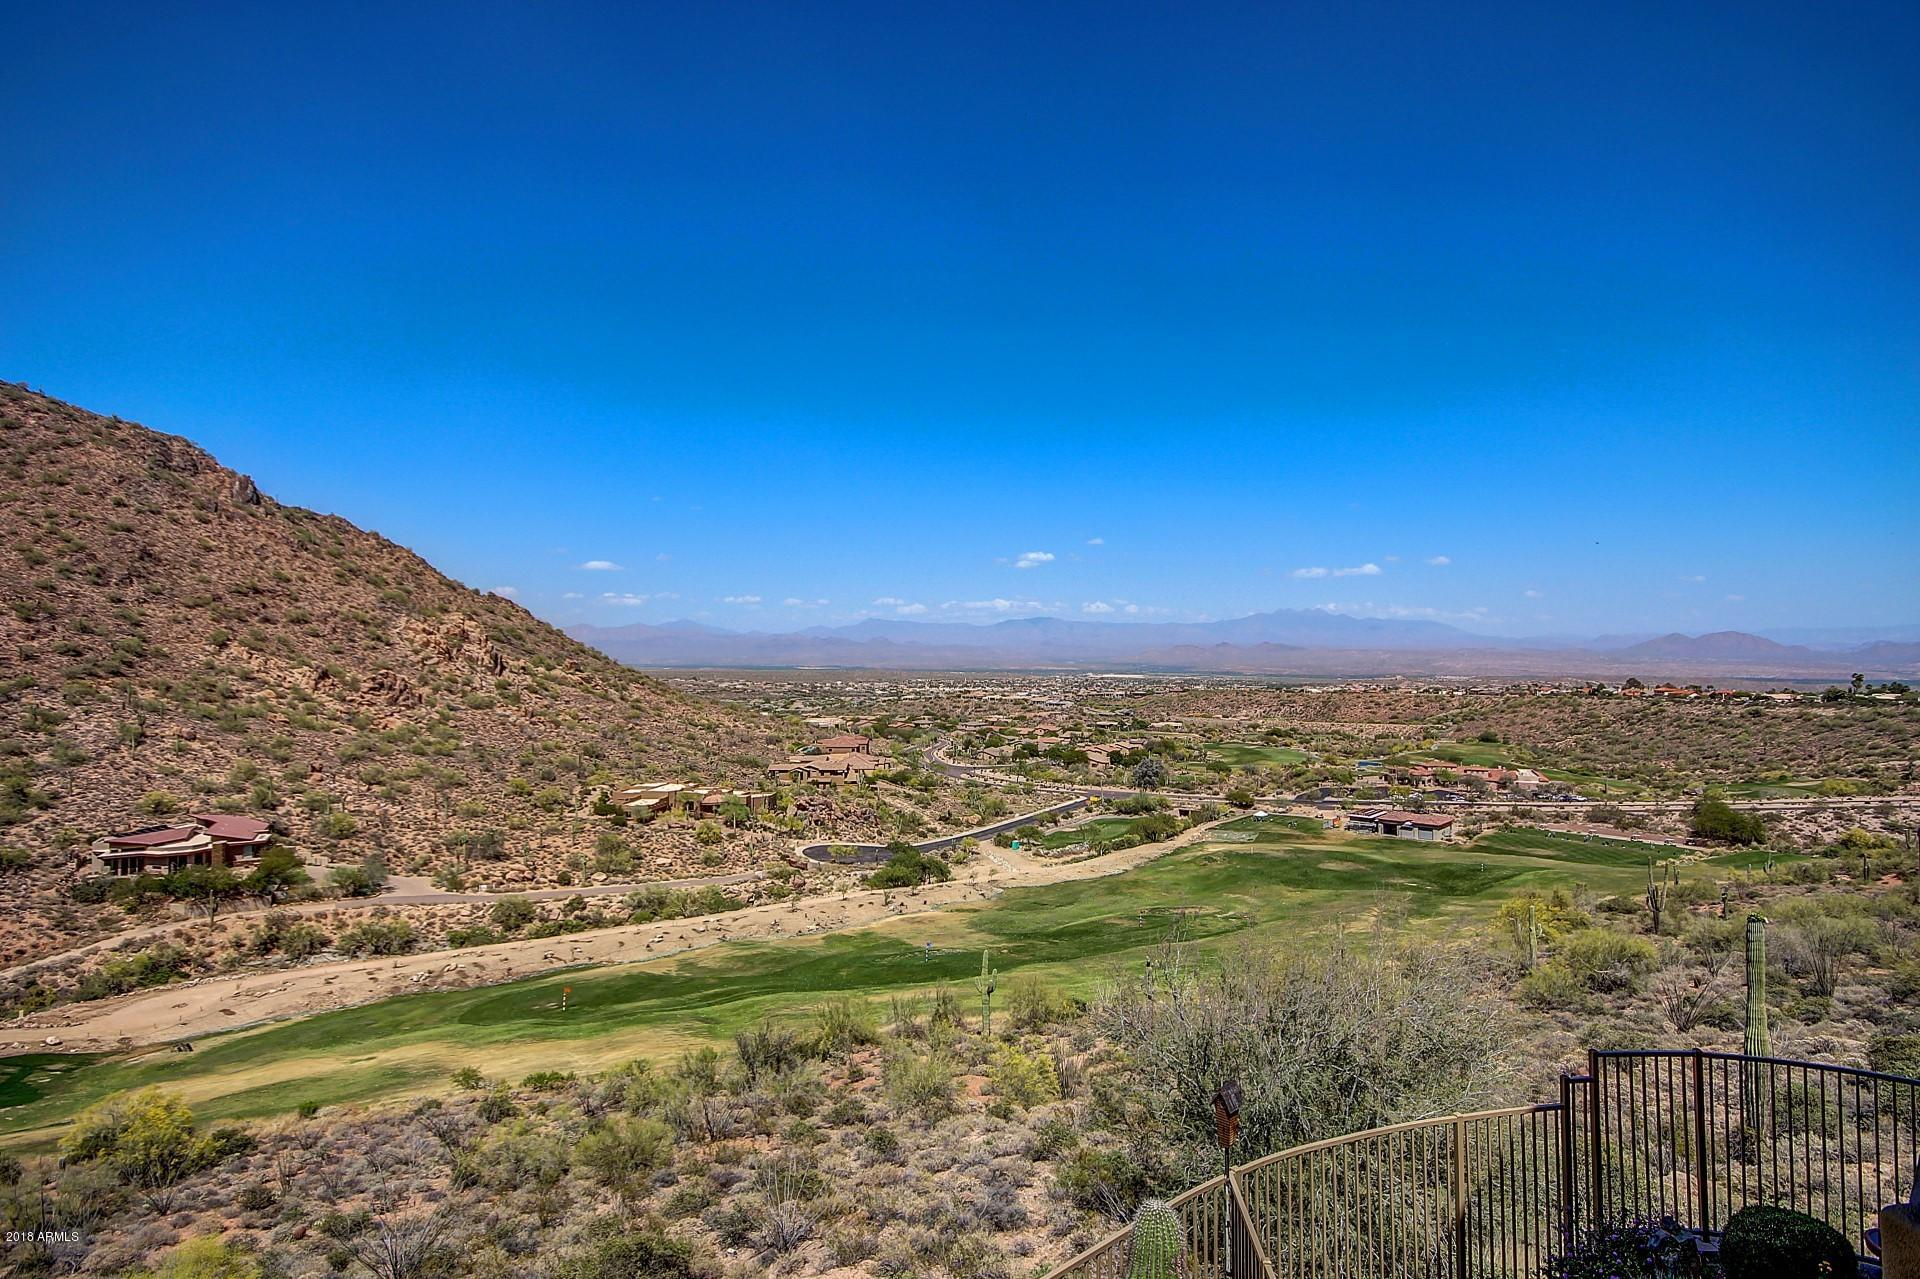 MLS 5835413 14850 E GRANDVIEW Drive Unit 209 Building 5, Fountain Hills, AZ 85268 Fountain Hills AZ Condo or Townhome